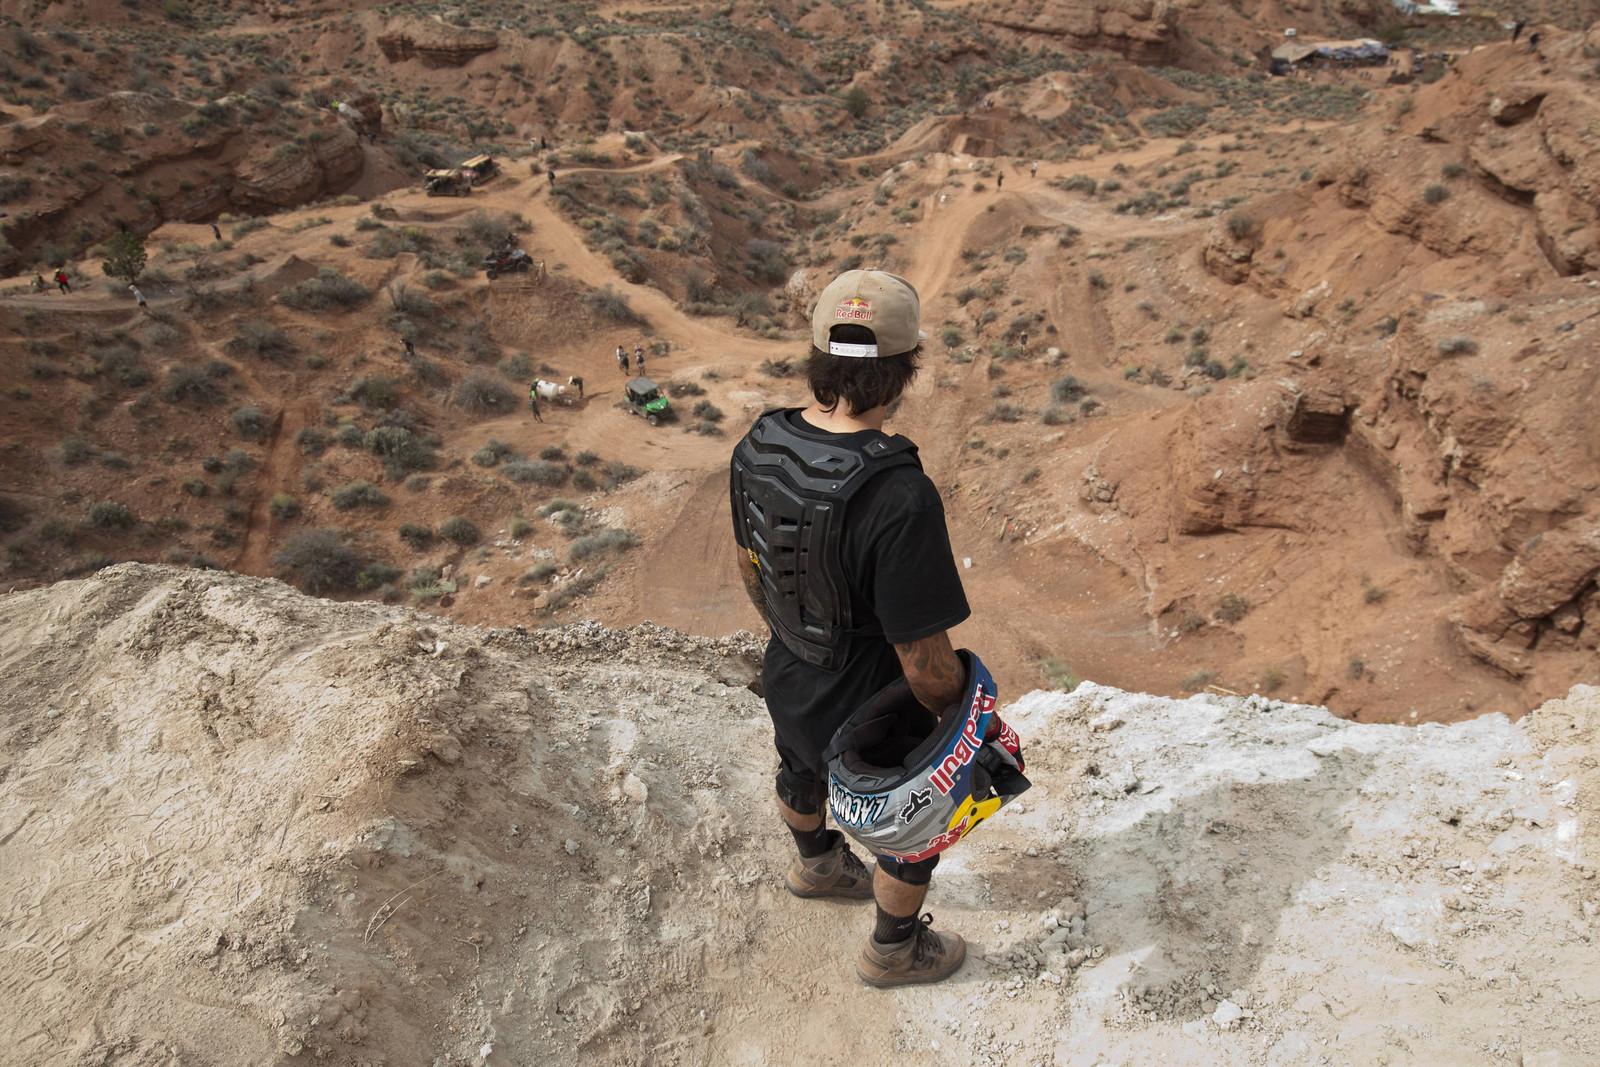 Andreu Ponders - Going Big at Rampage - Line Testing - Mountain Biking Pictures - Vital MTB